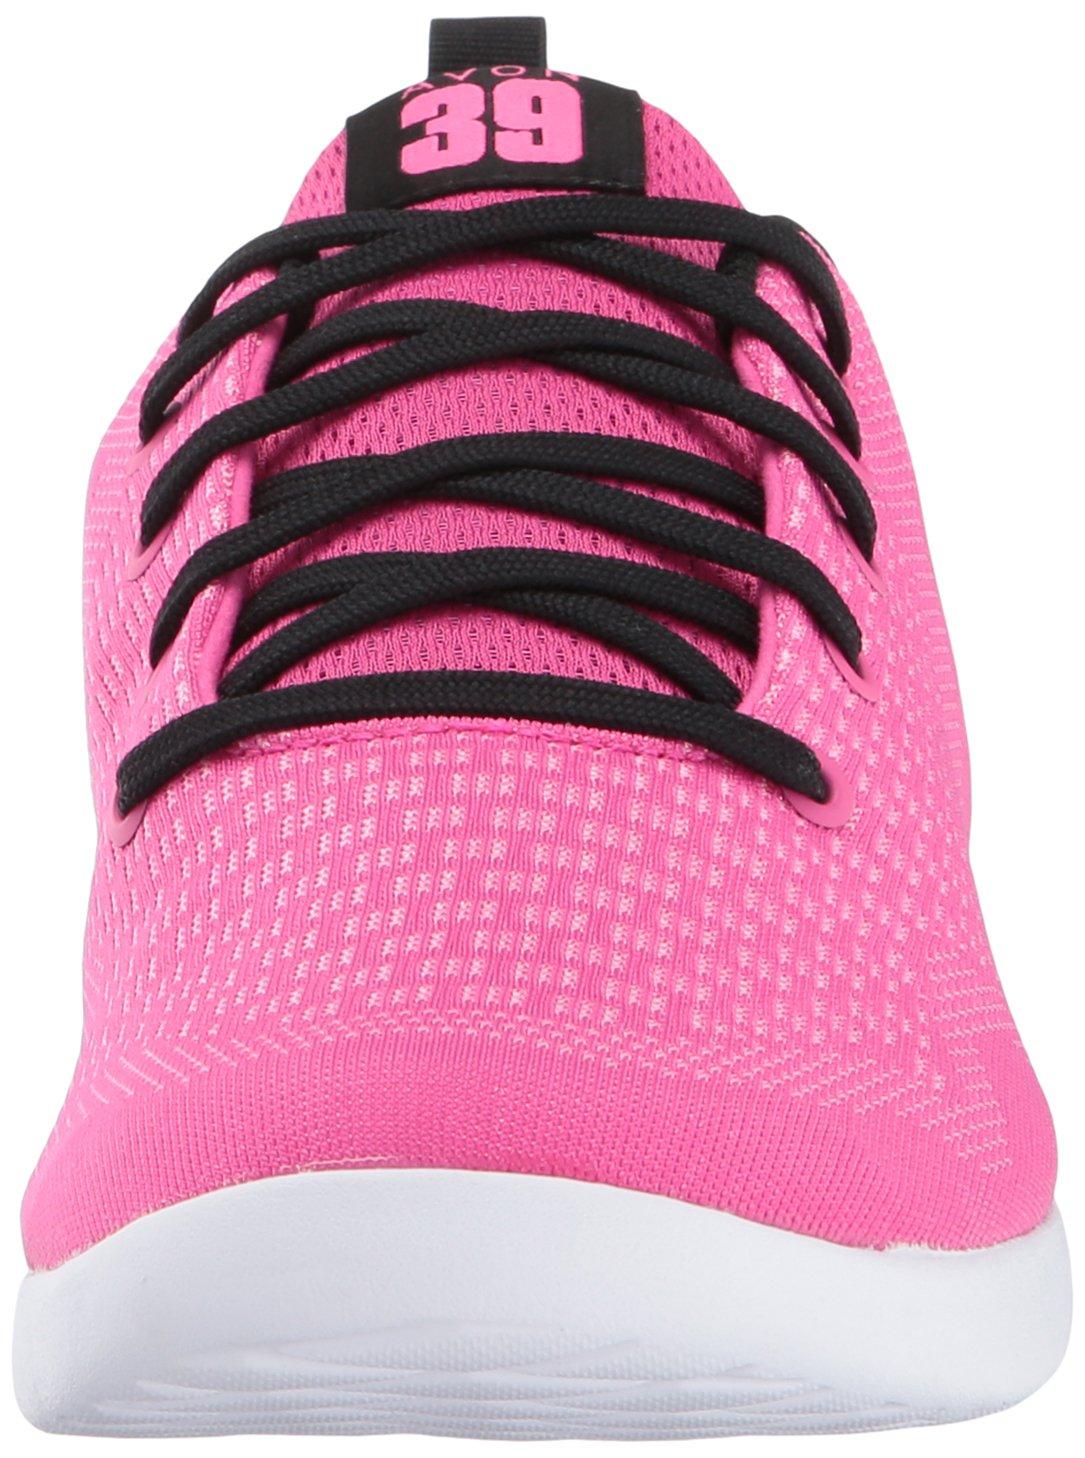 Reebok Women's Esoterra DMX Lite Track Shoe B01MRXGE1K 11 B(M) US Poison Pink/Rose Rage/White/Black